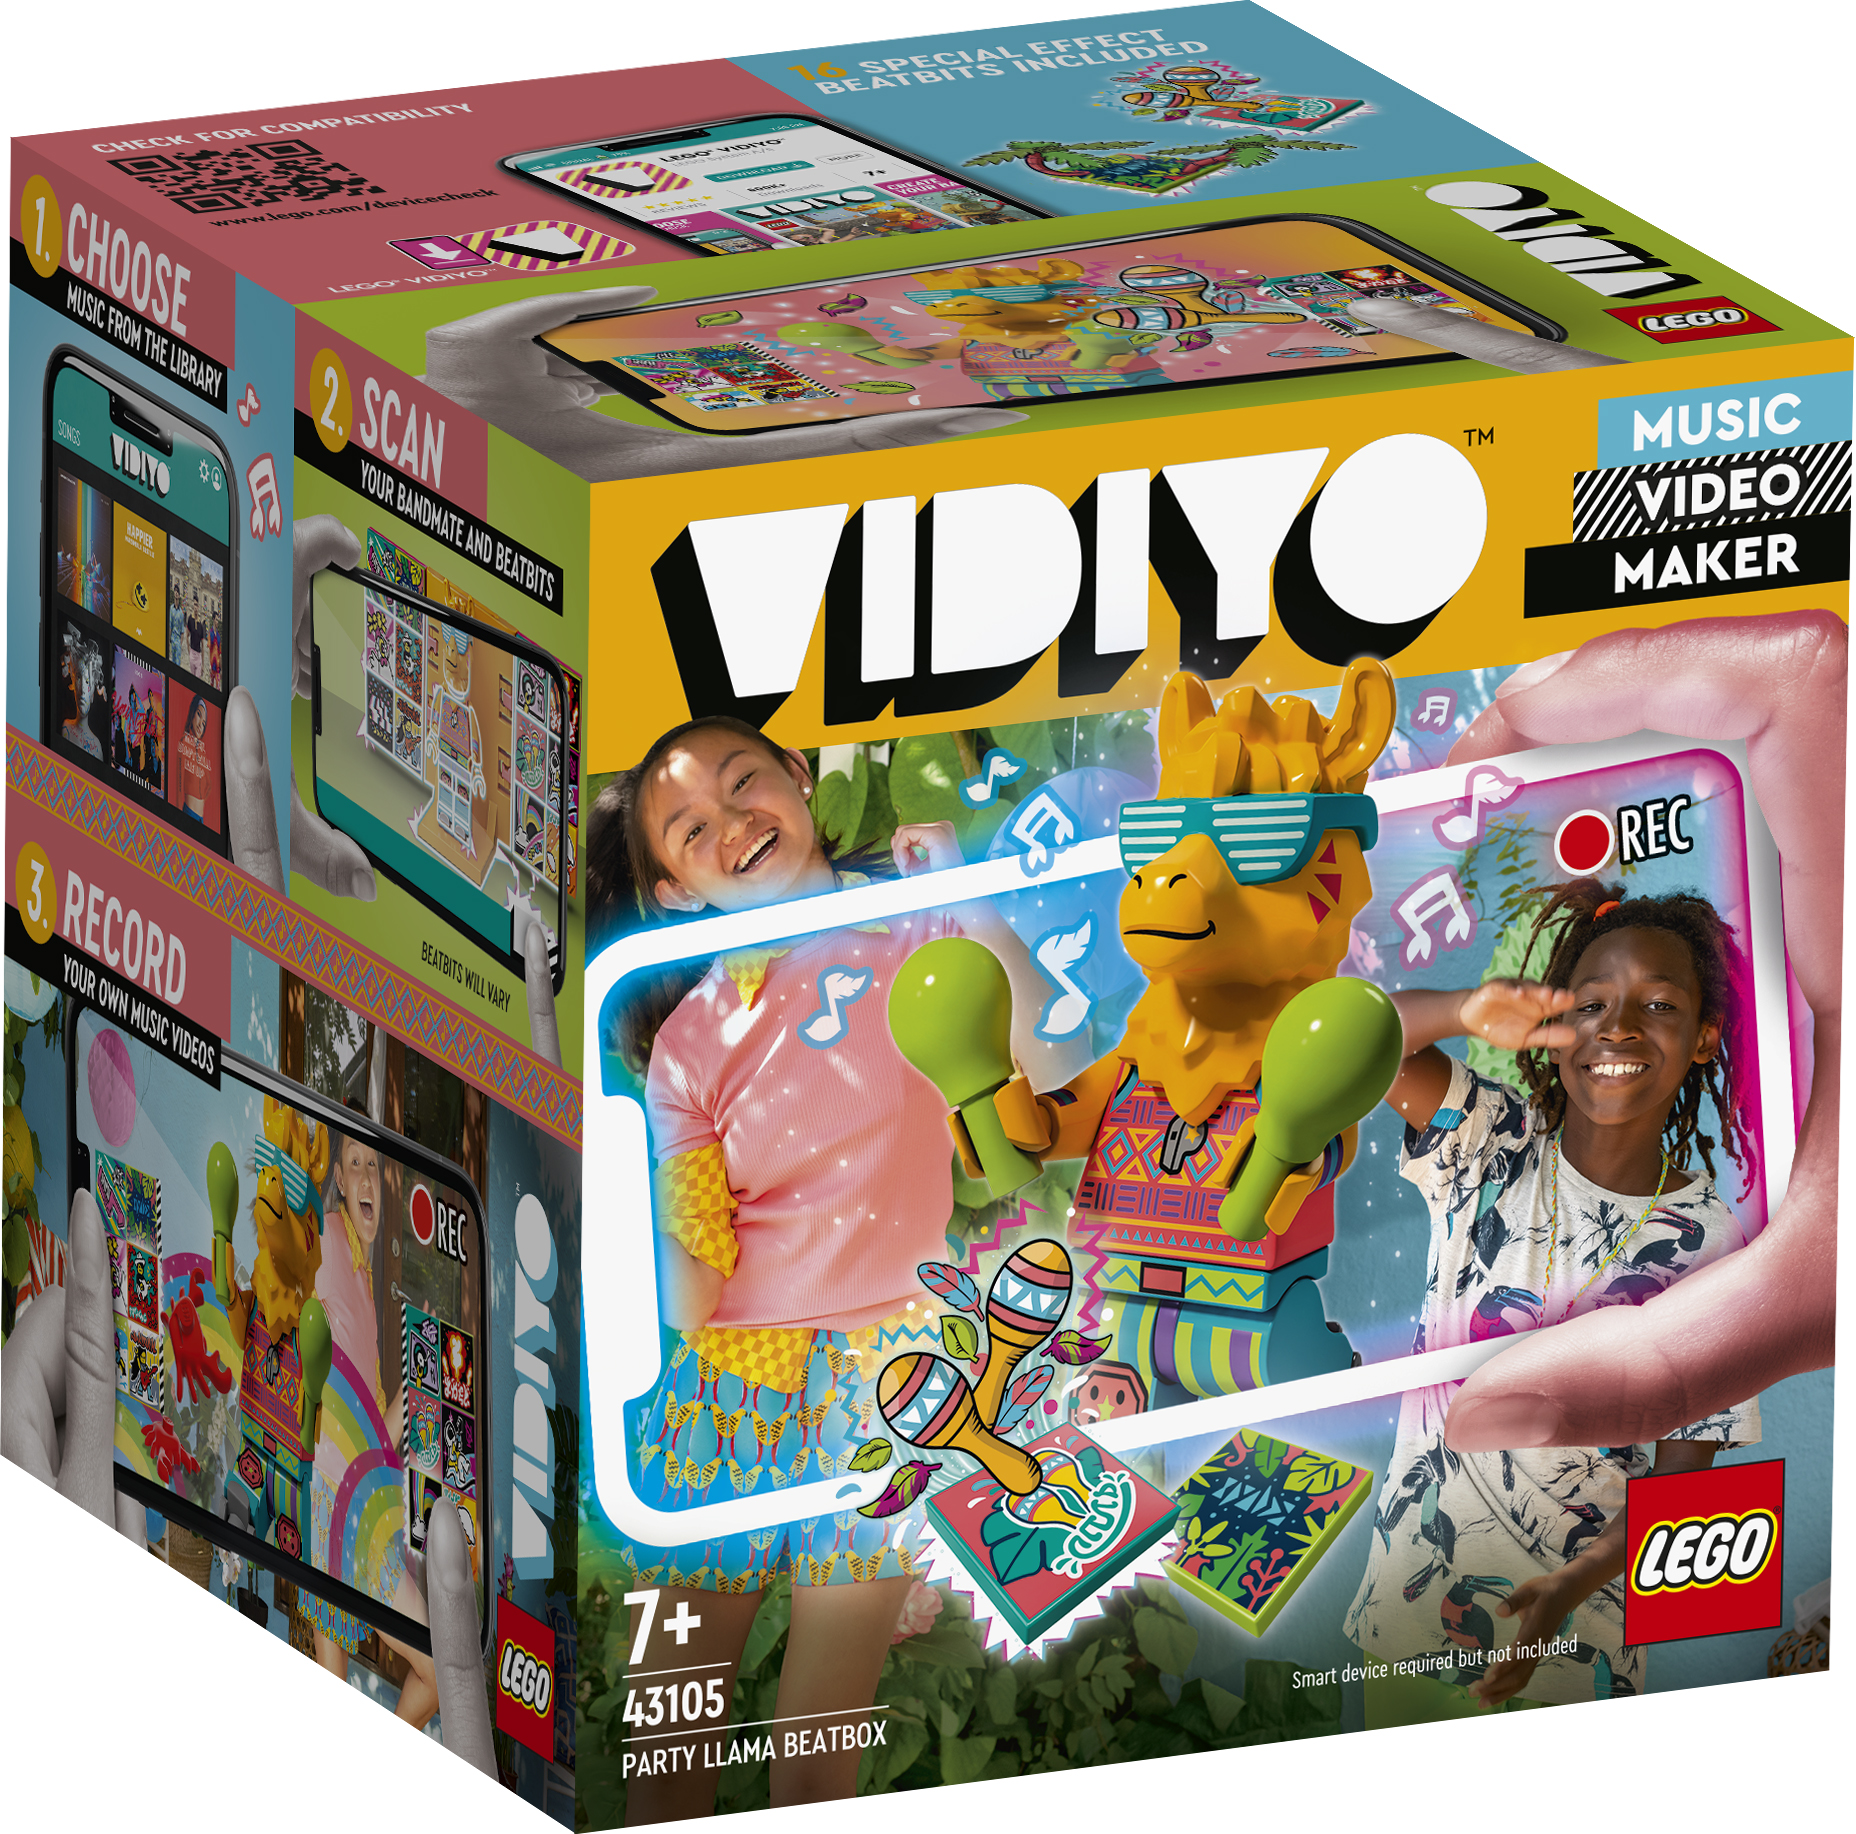 LEGO Vidiyo Party Llama BeatBox - 43105